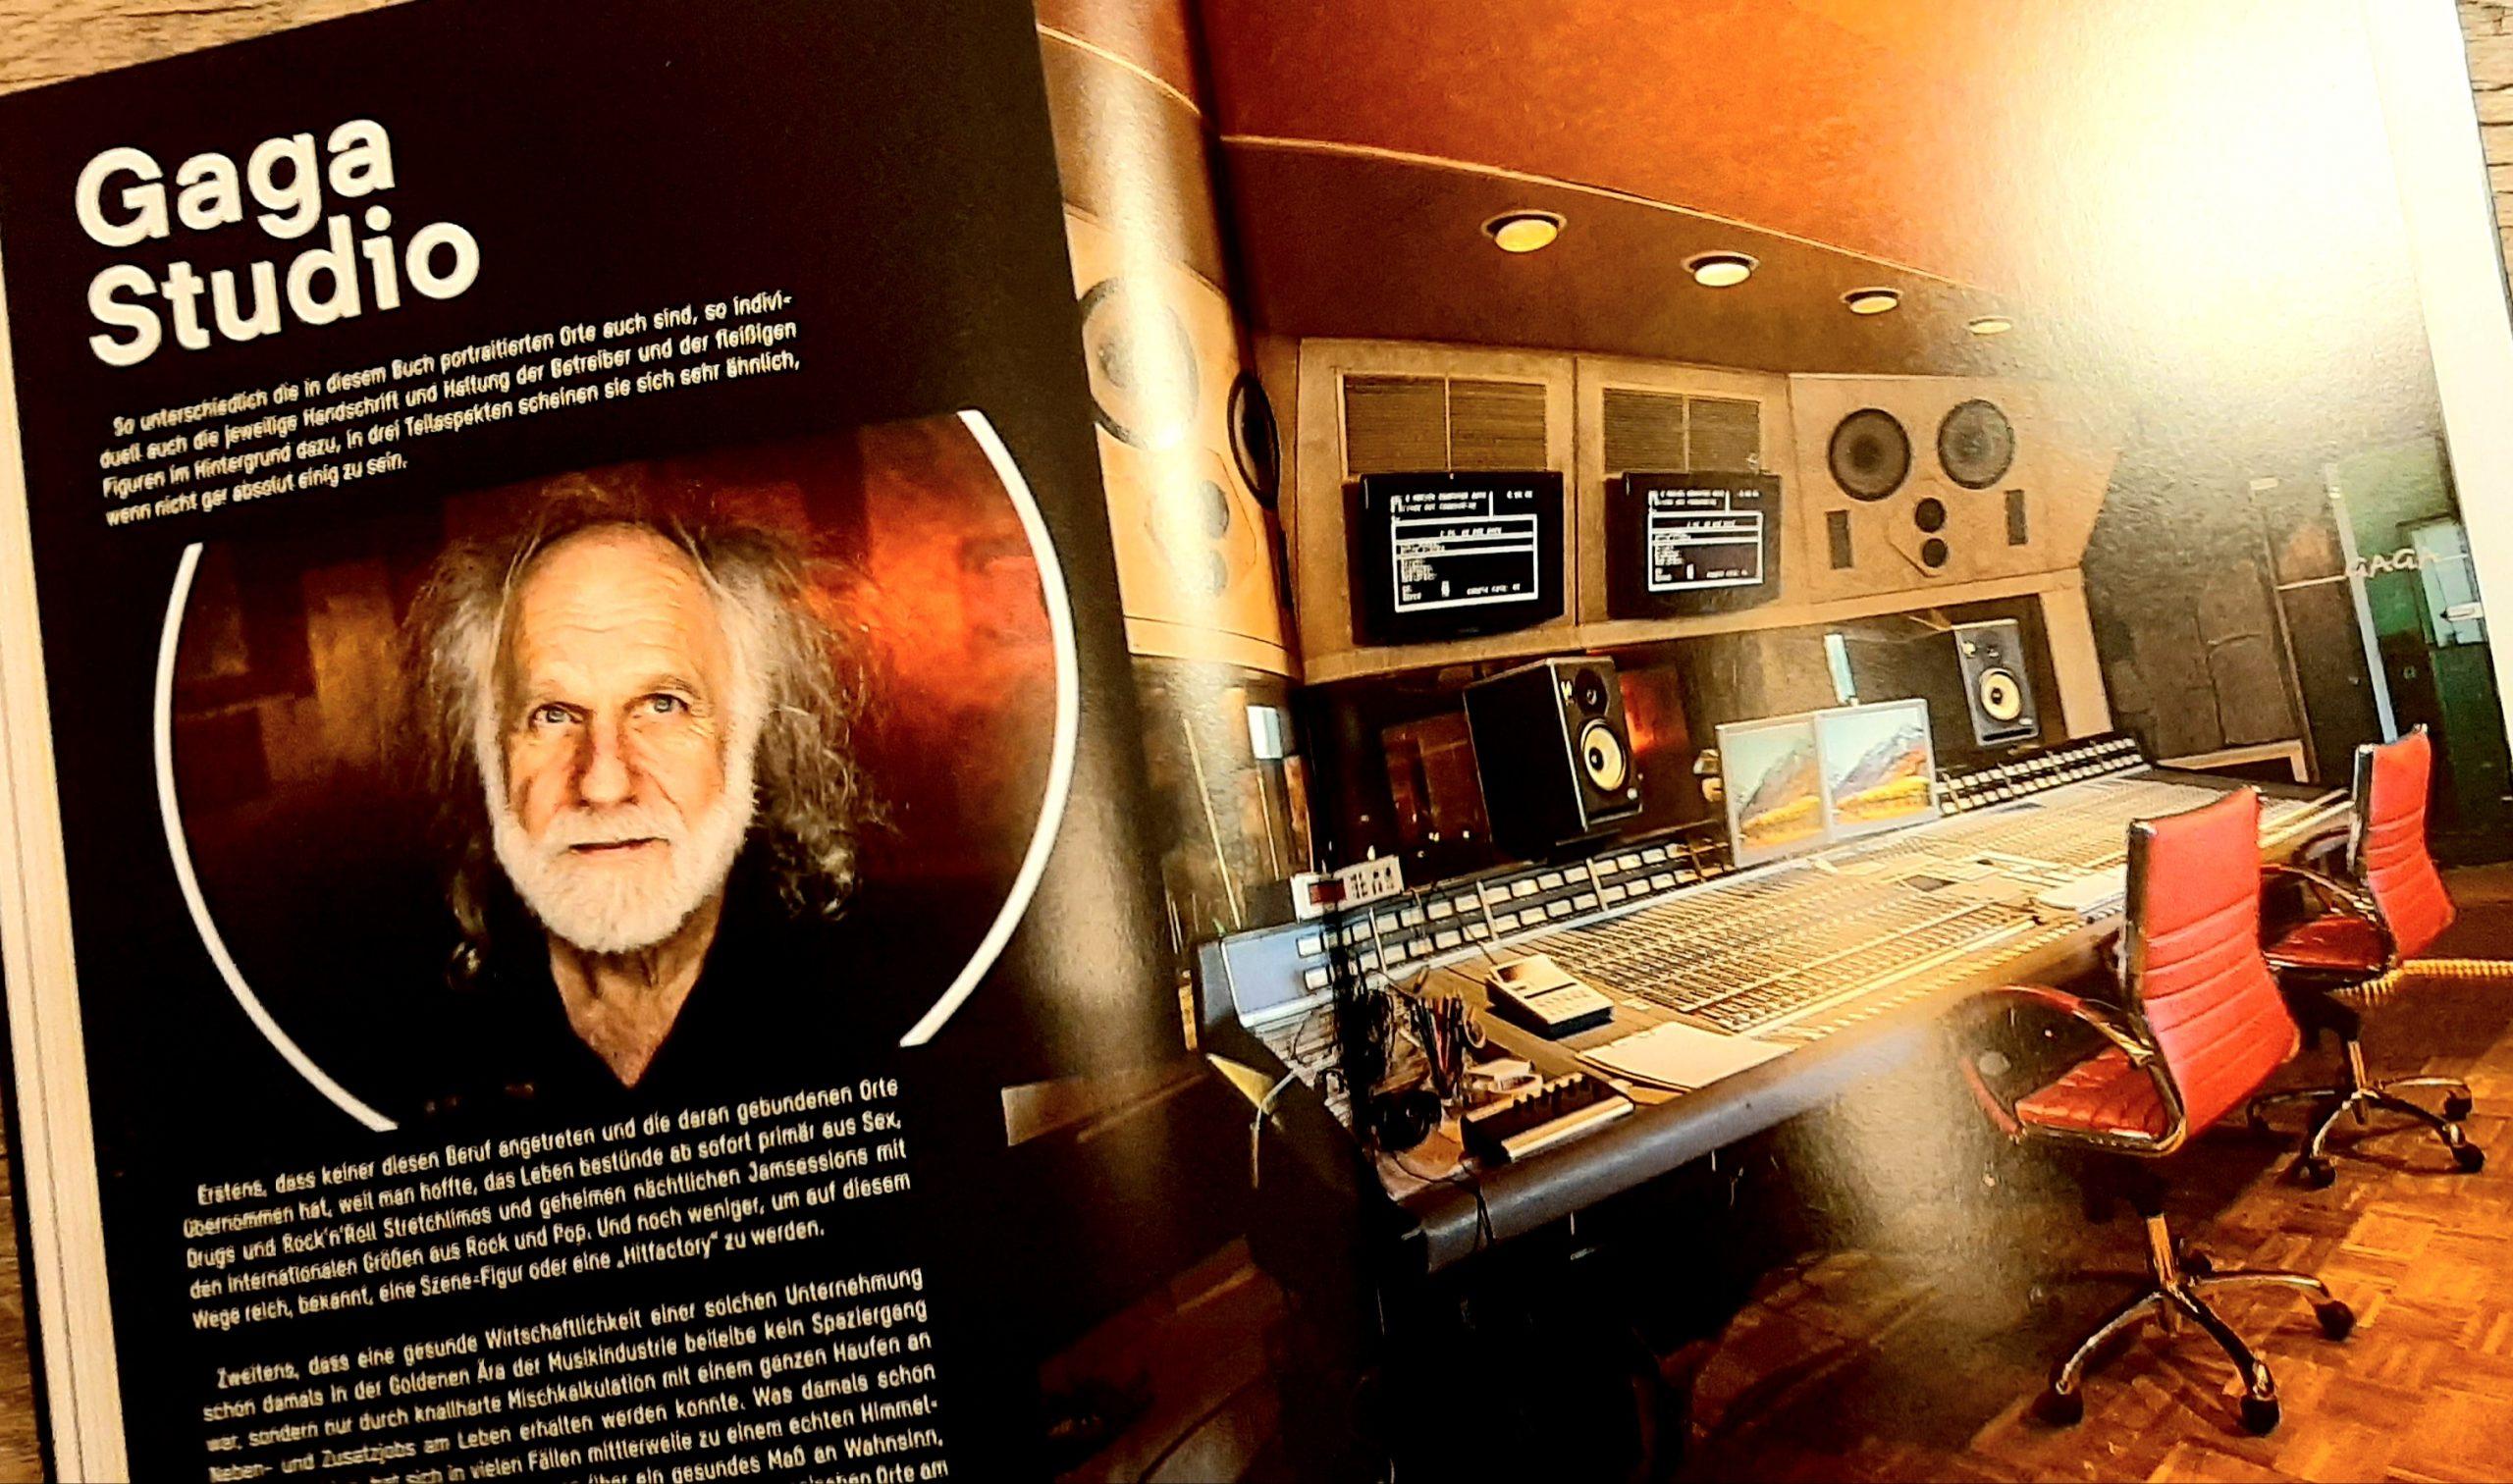 Sound, Production, Musikstudio, Clouds Hill, Soundlotsen, Musikbuch, Musikbücher, Hans-Jürgen Steffen, Gaga Studios